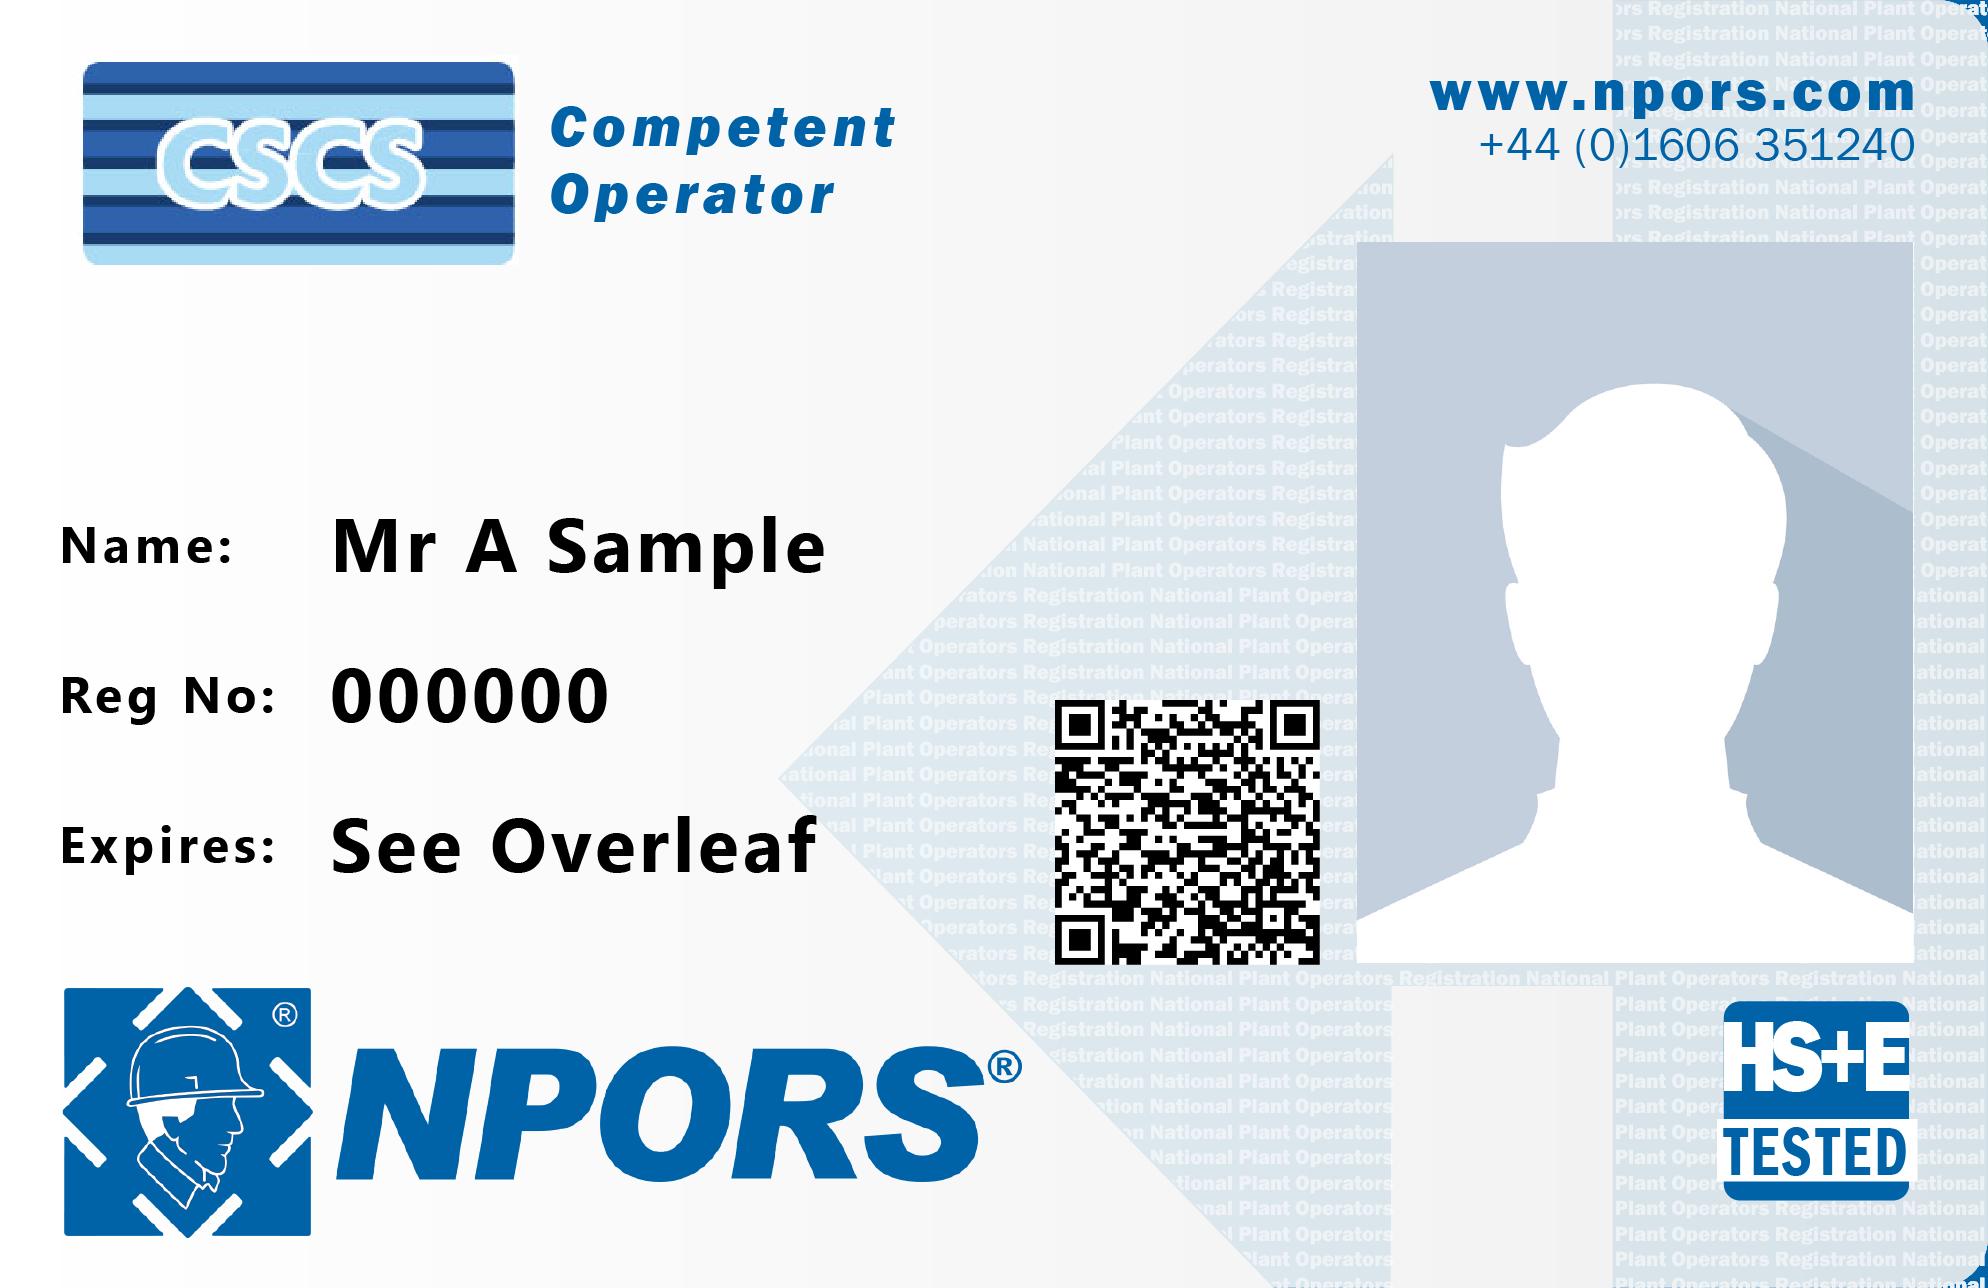 NPORS Competent operator